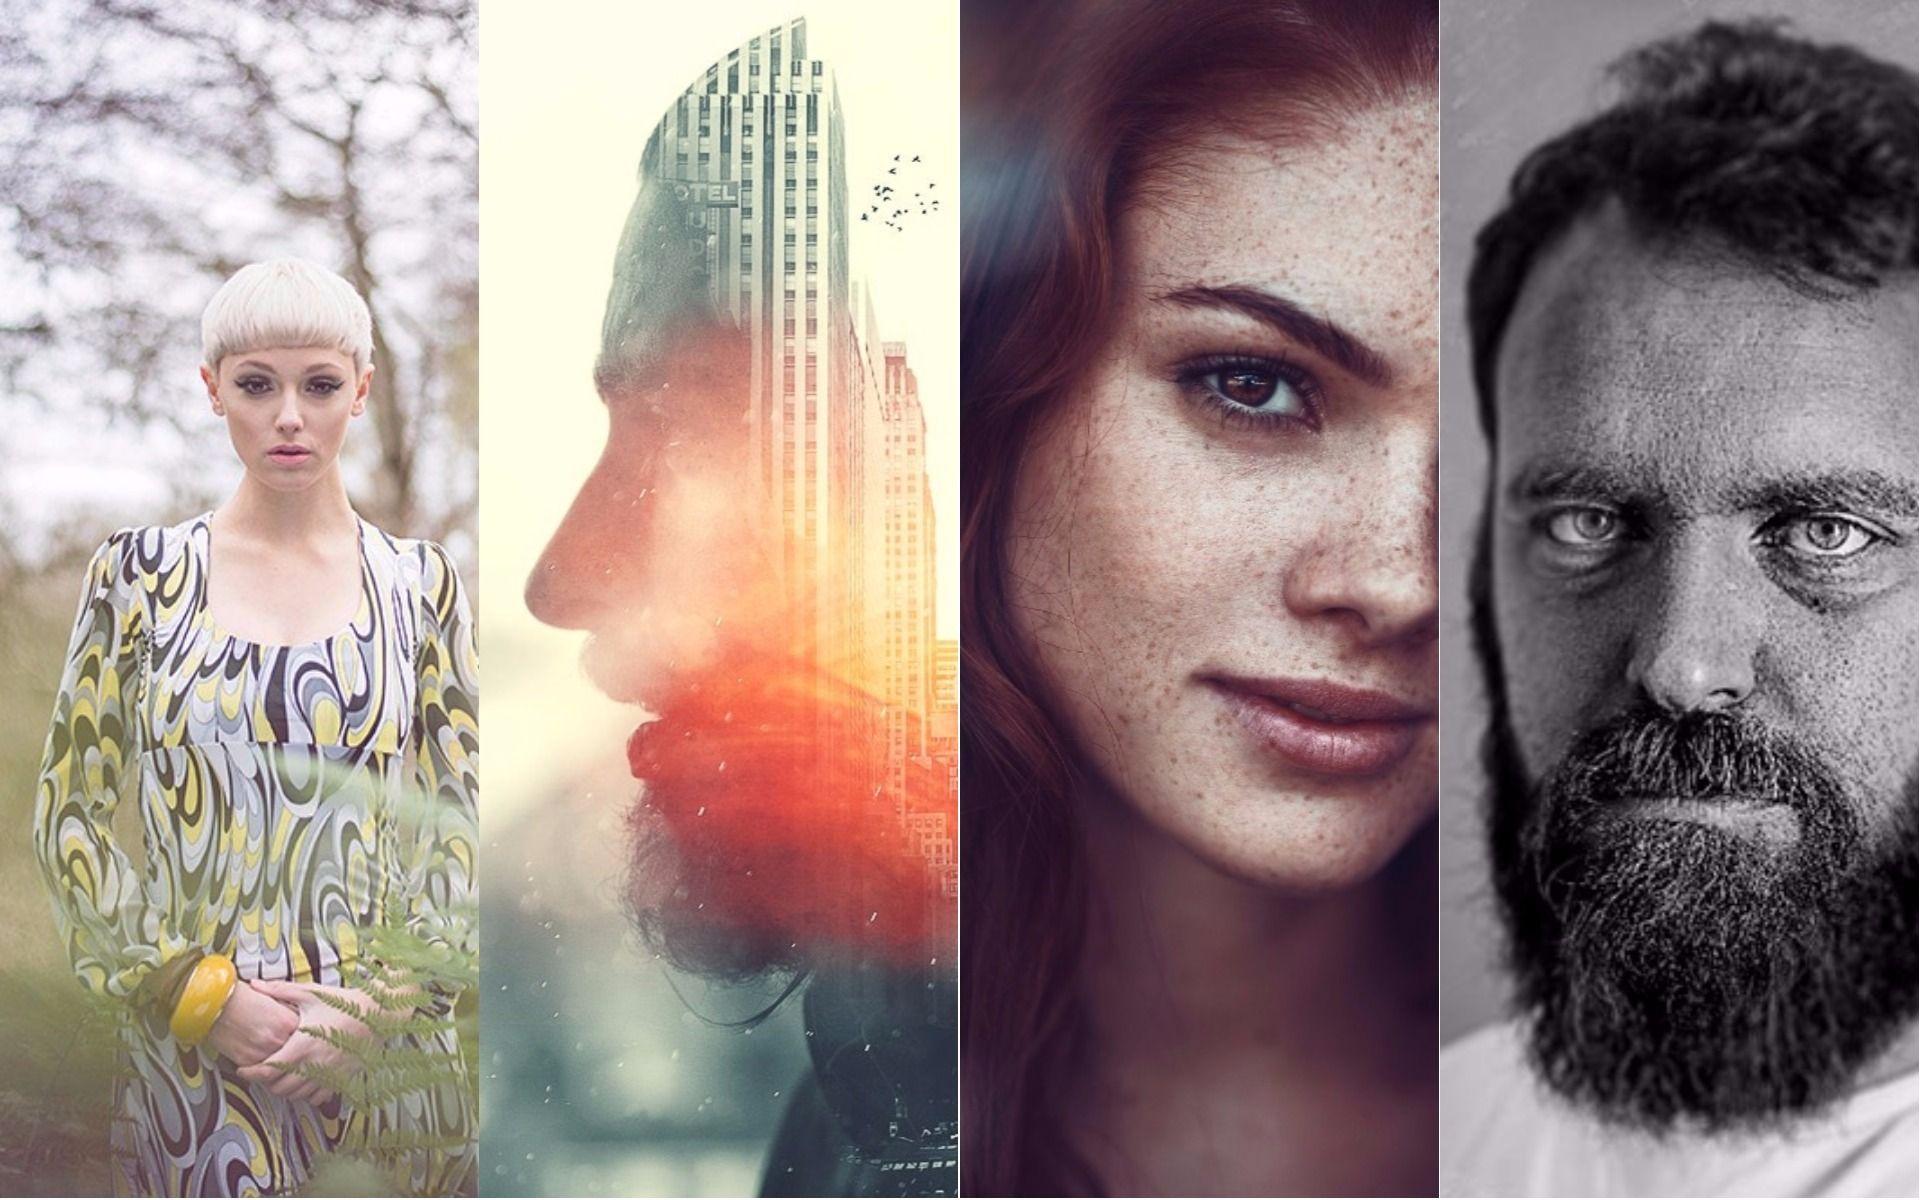 Lightroom tutorials for portraits